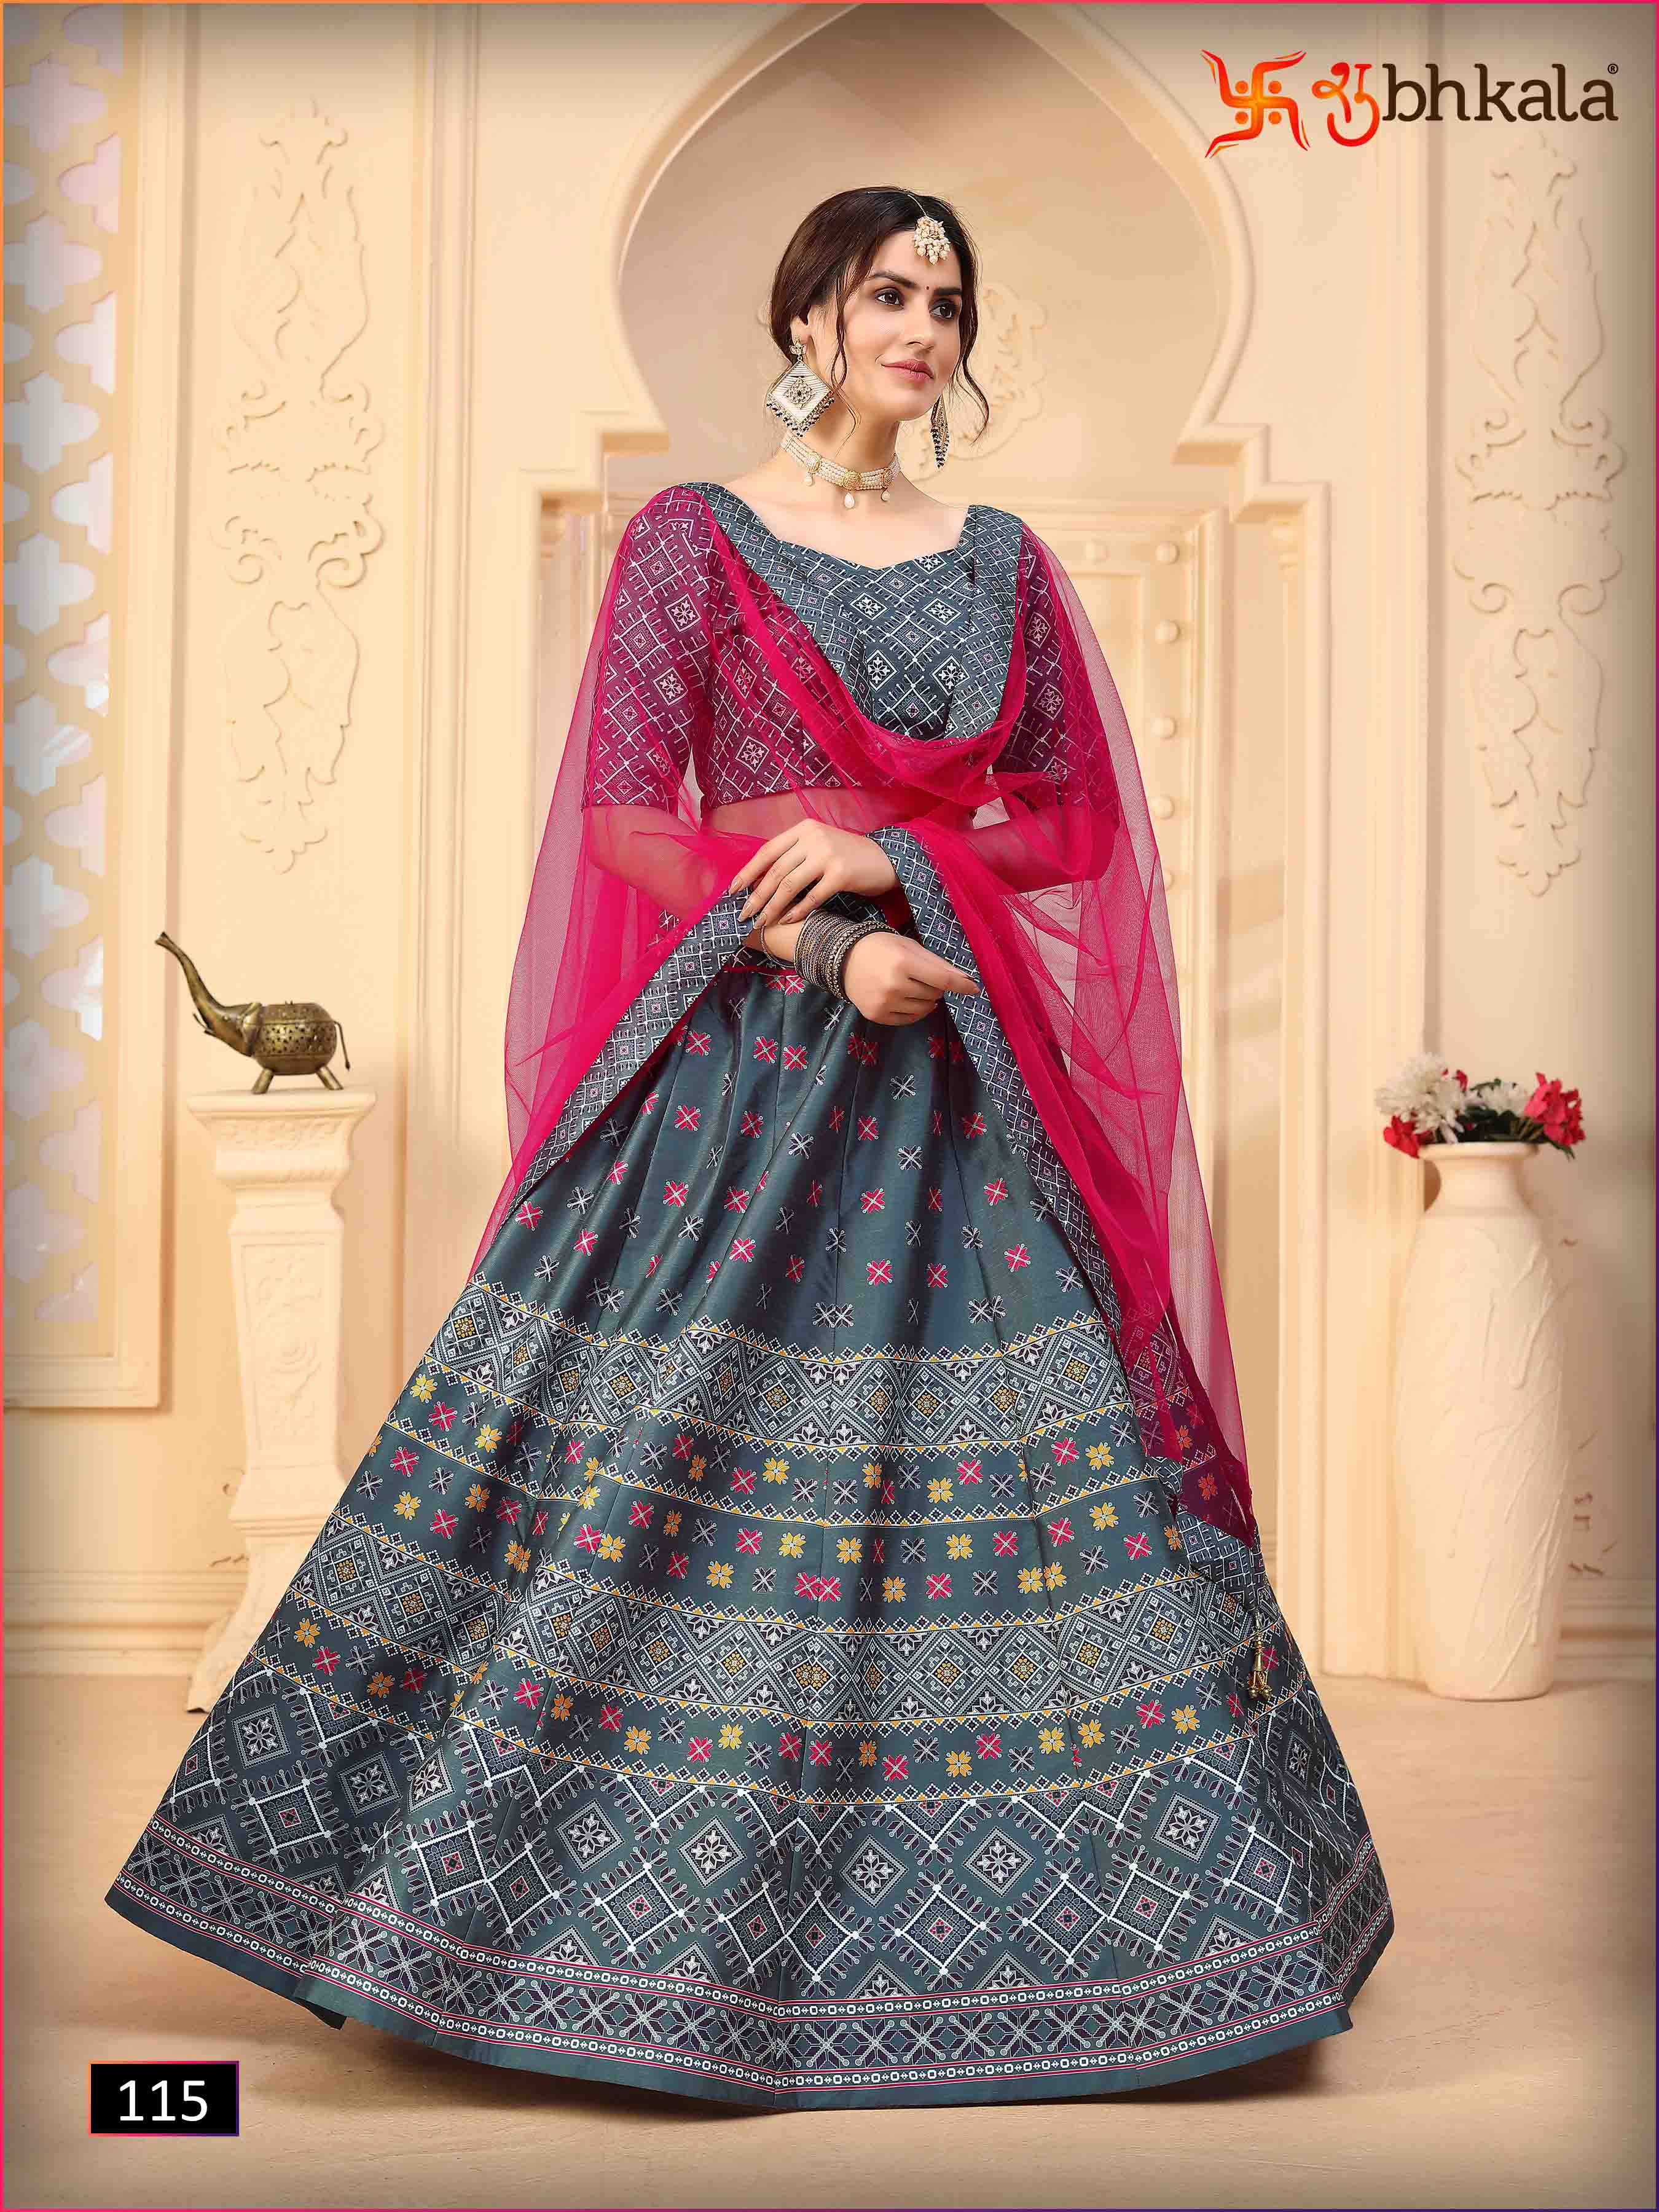 Kf Presents Floral Vol 2 Exclusive Designer Wedding Wear Lehenga